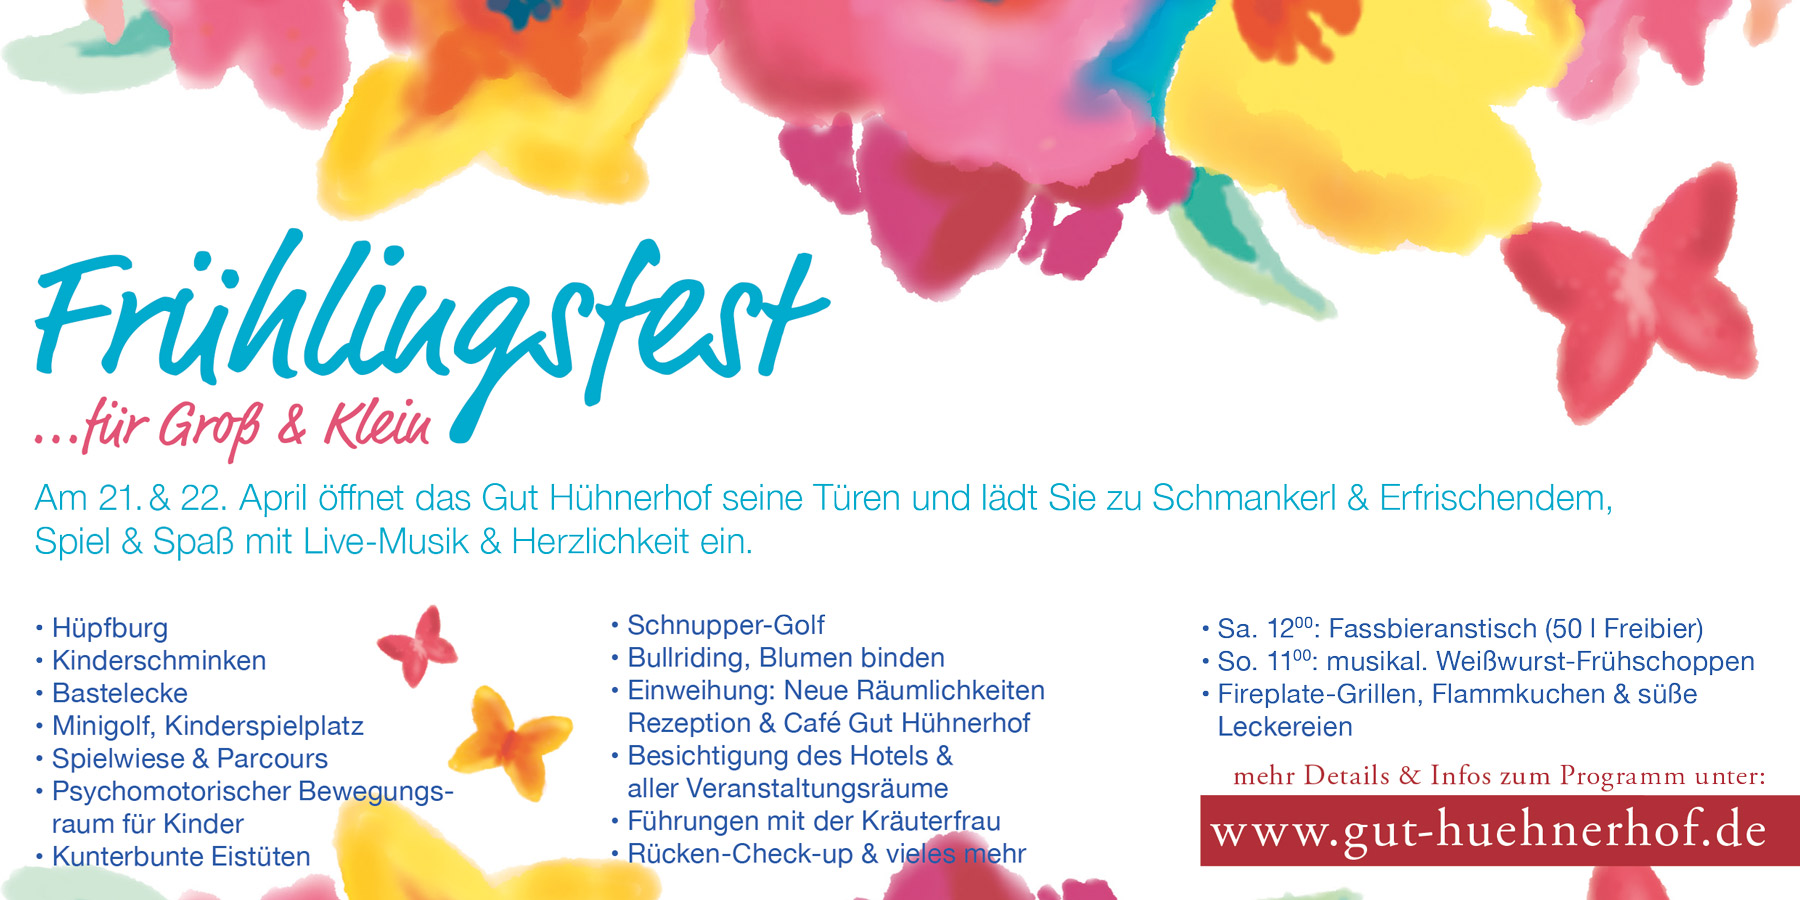 Frühlingsfest Gut Hühnerhof 21. & 22. April